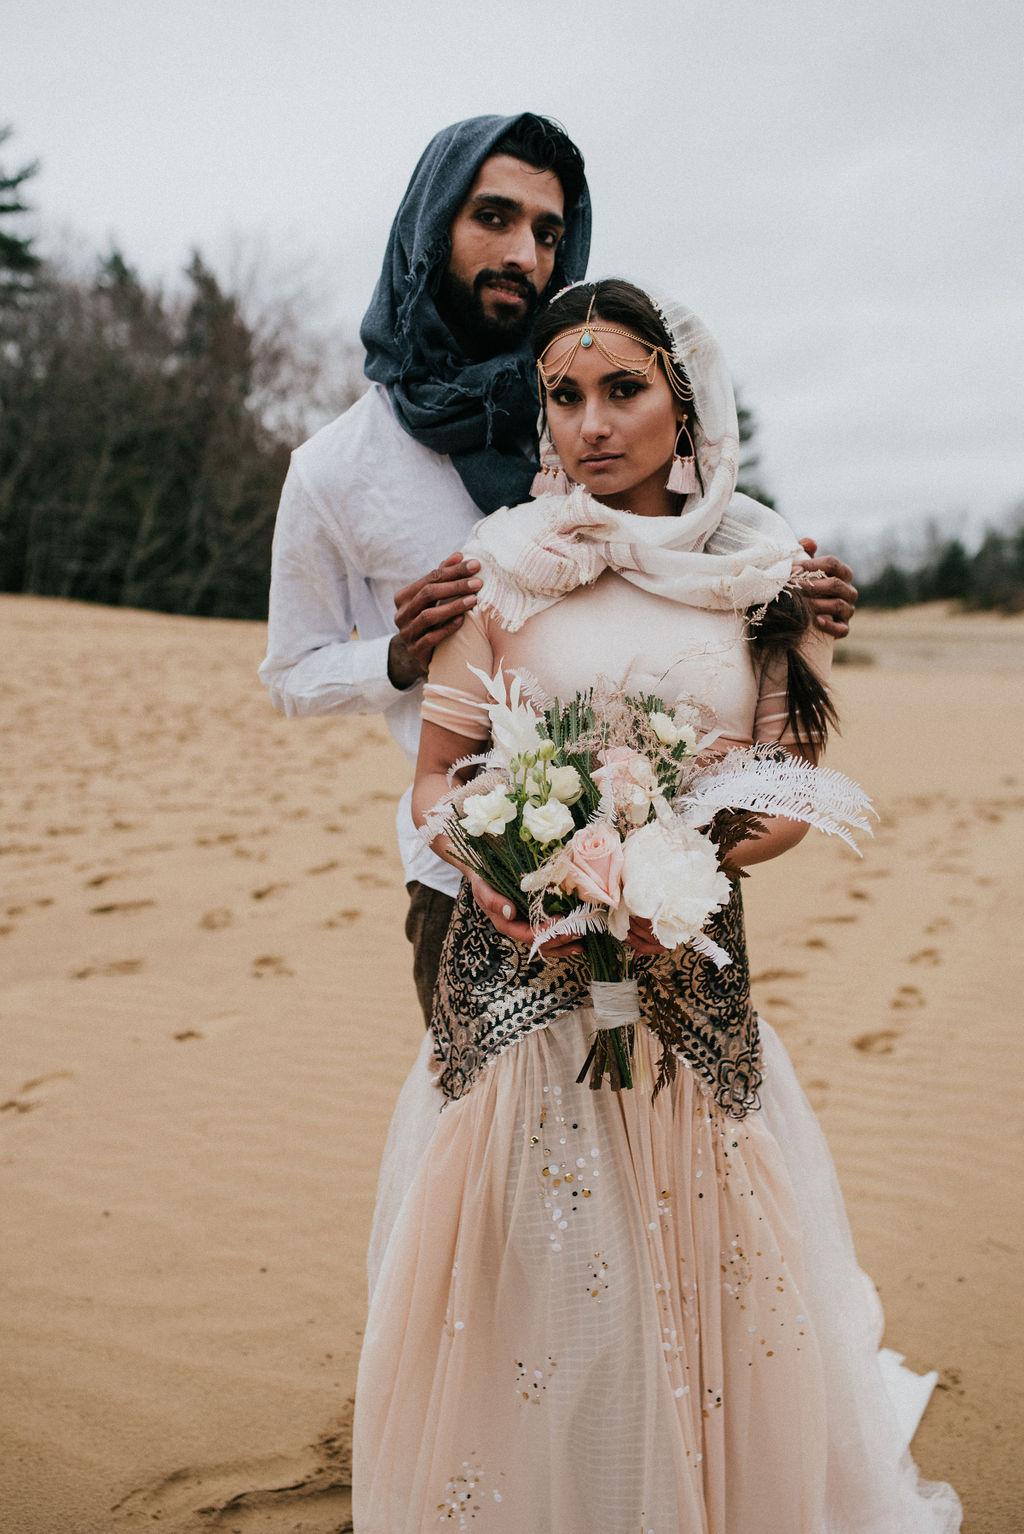 CodyJamesBarryPhotography_Aladdin-186.jpg